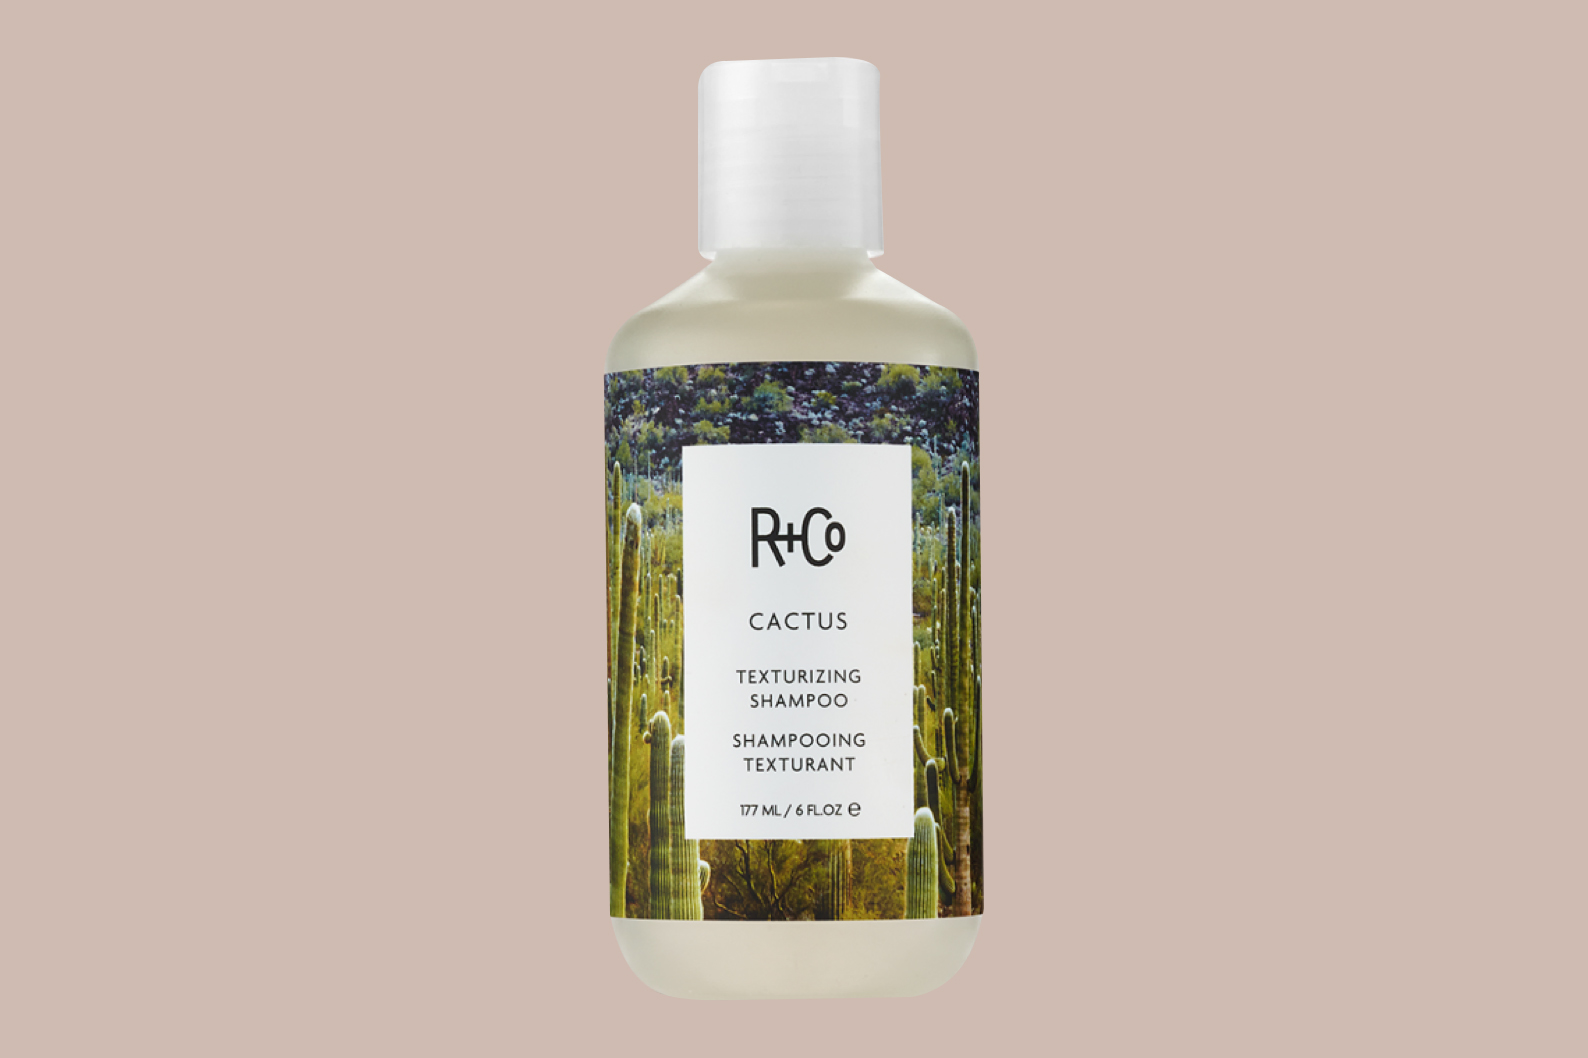 r + co cactus texturizing shampoo,